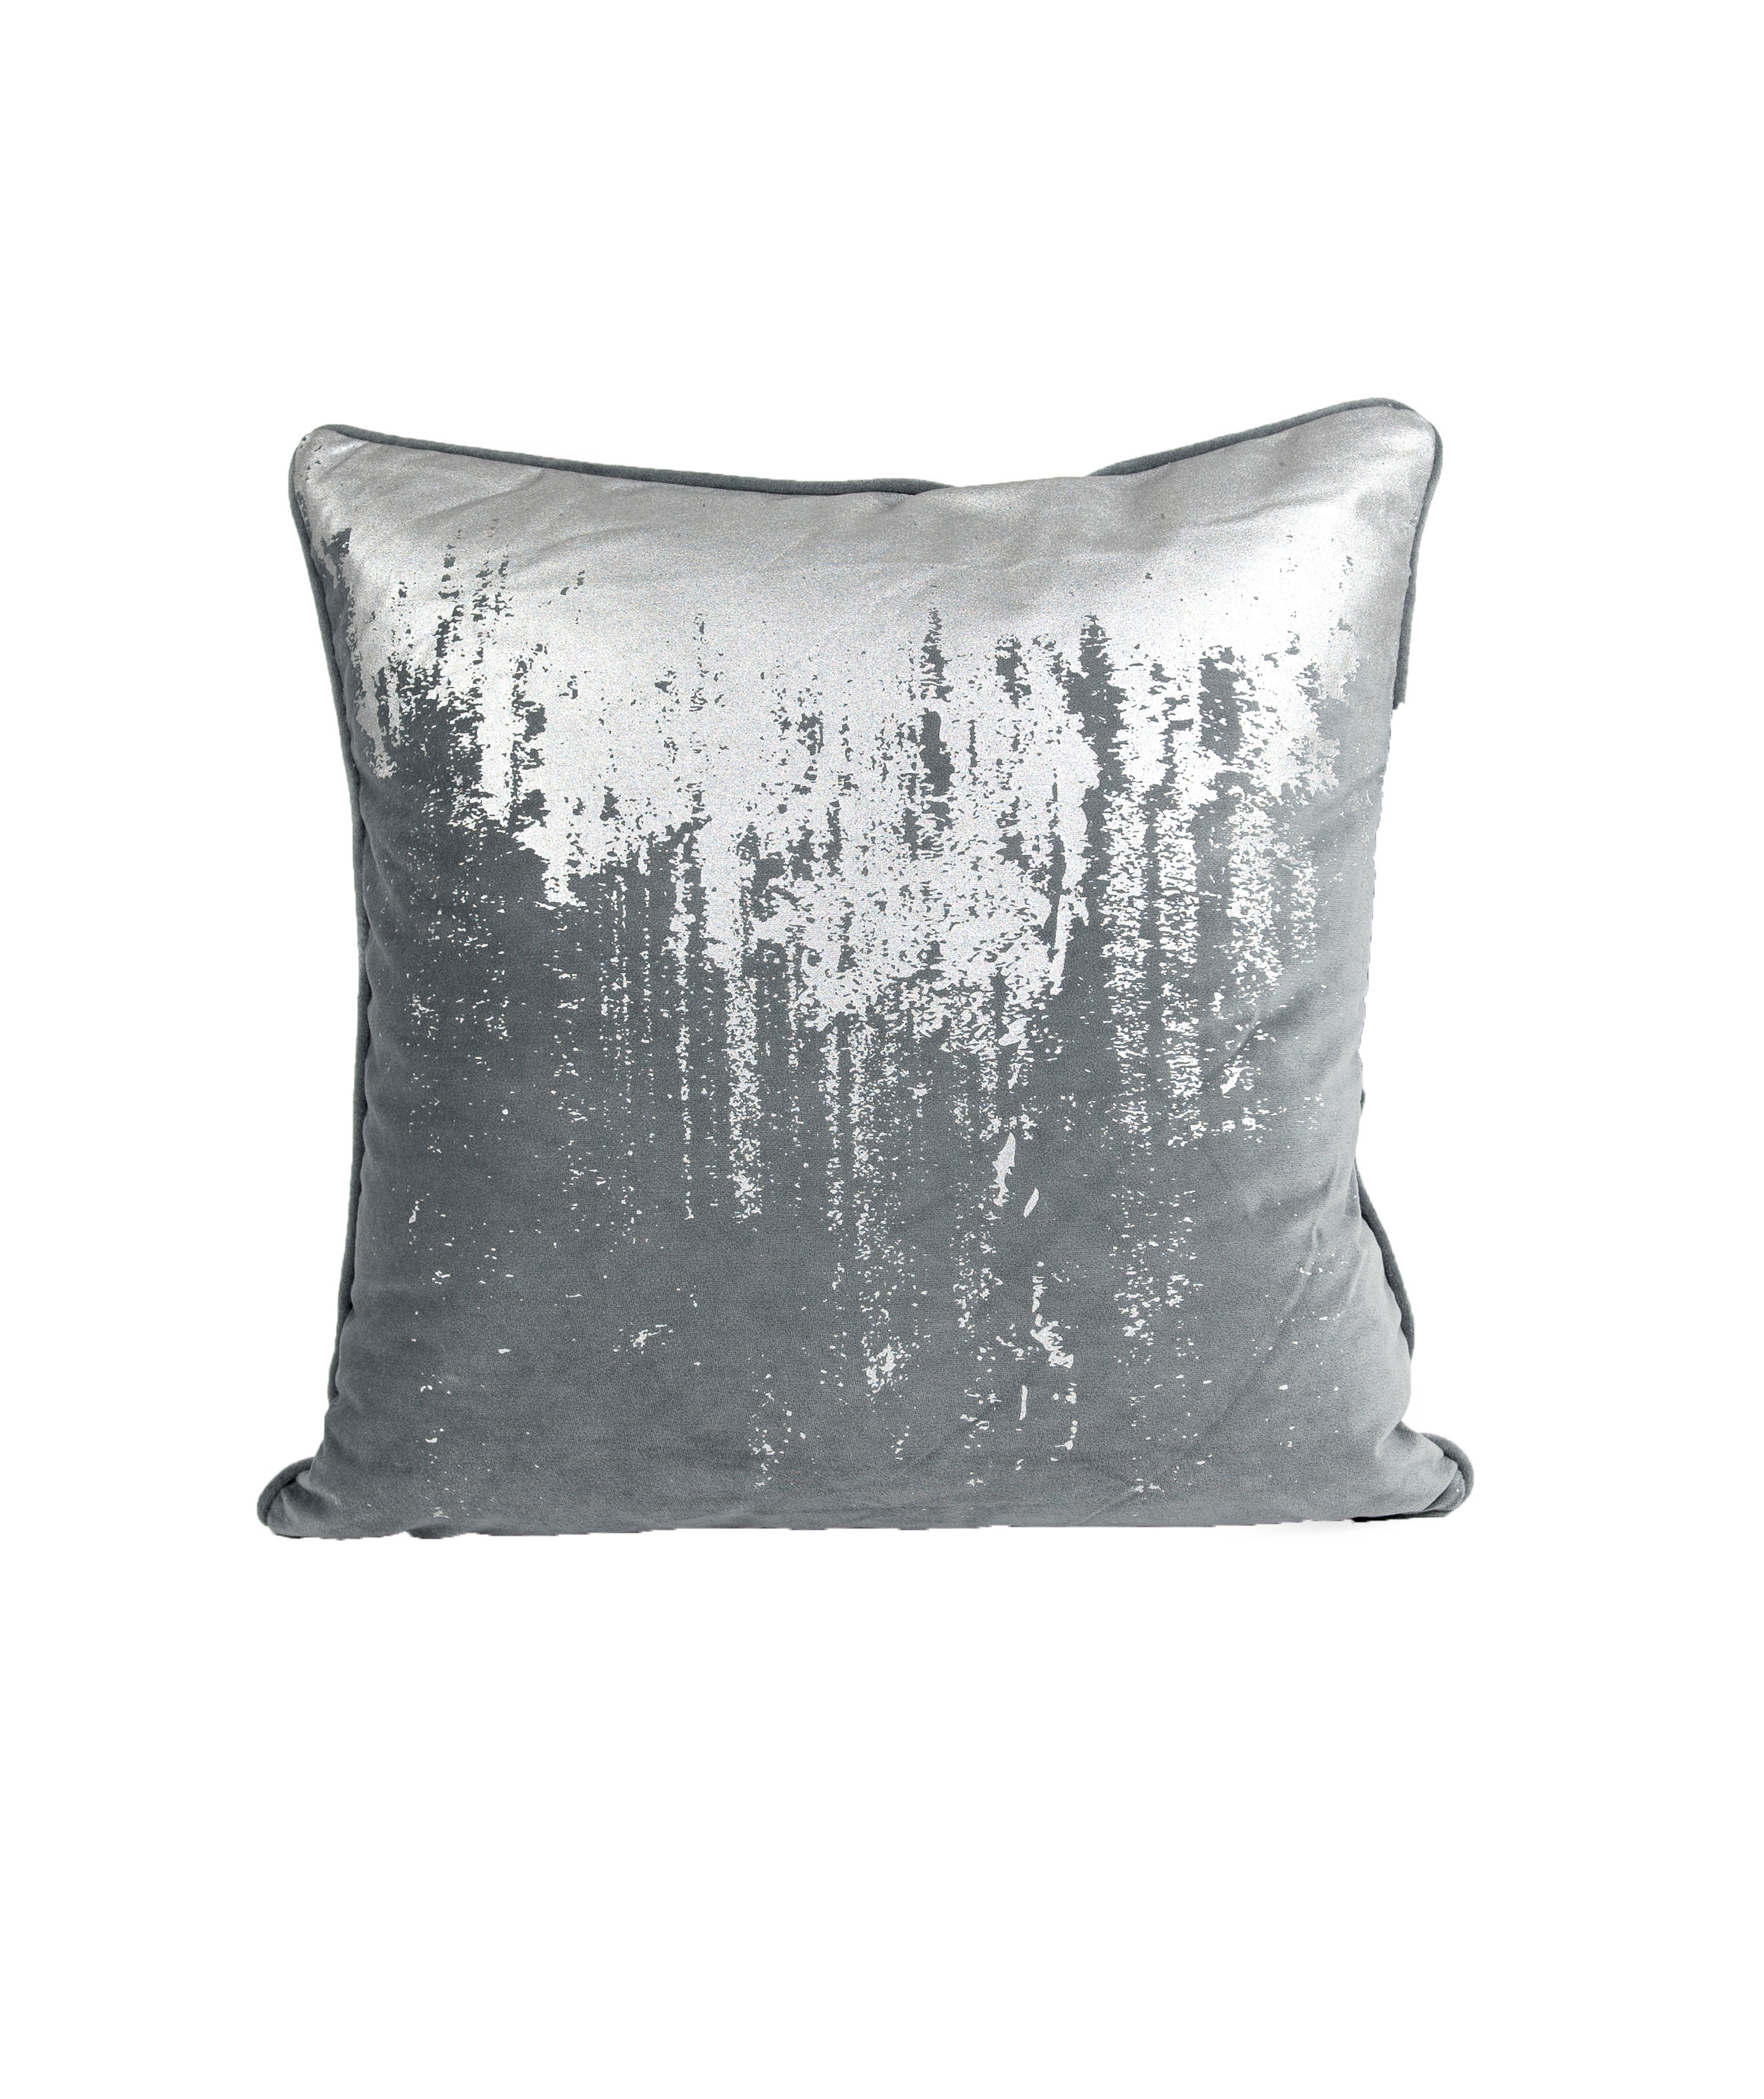 dekokissen reginald 50x50 cm charcoal silver ohne f llkissen. Black Bedroom Furniture Sets. Home Design Ideas